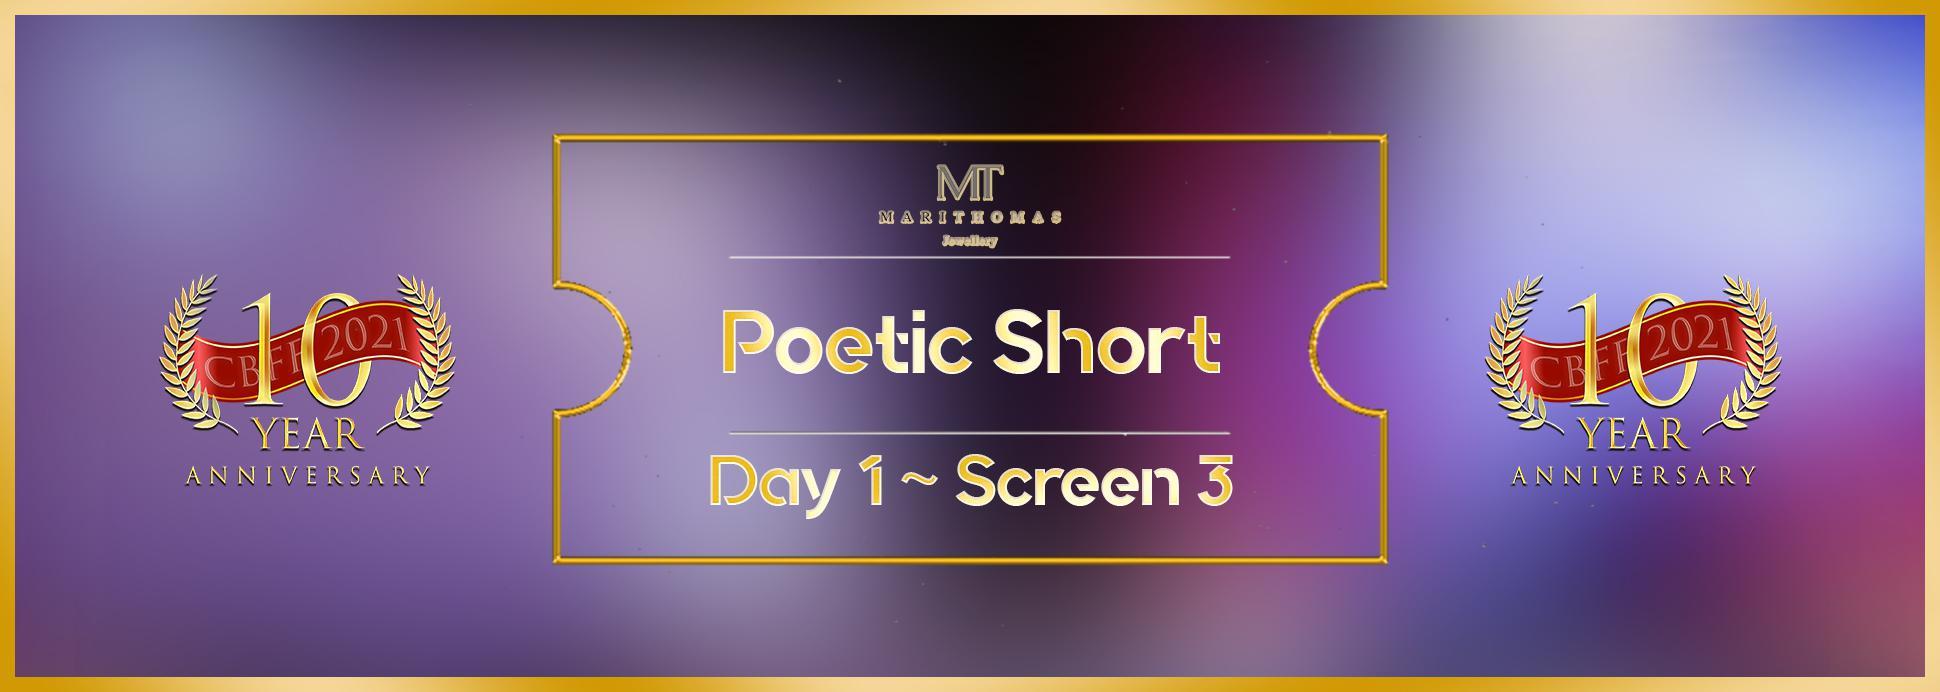 Day 1, Screen 3: Poetic short